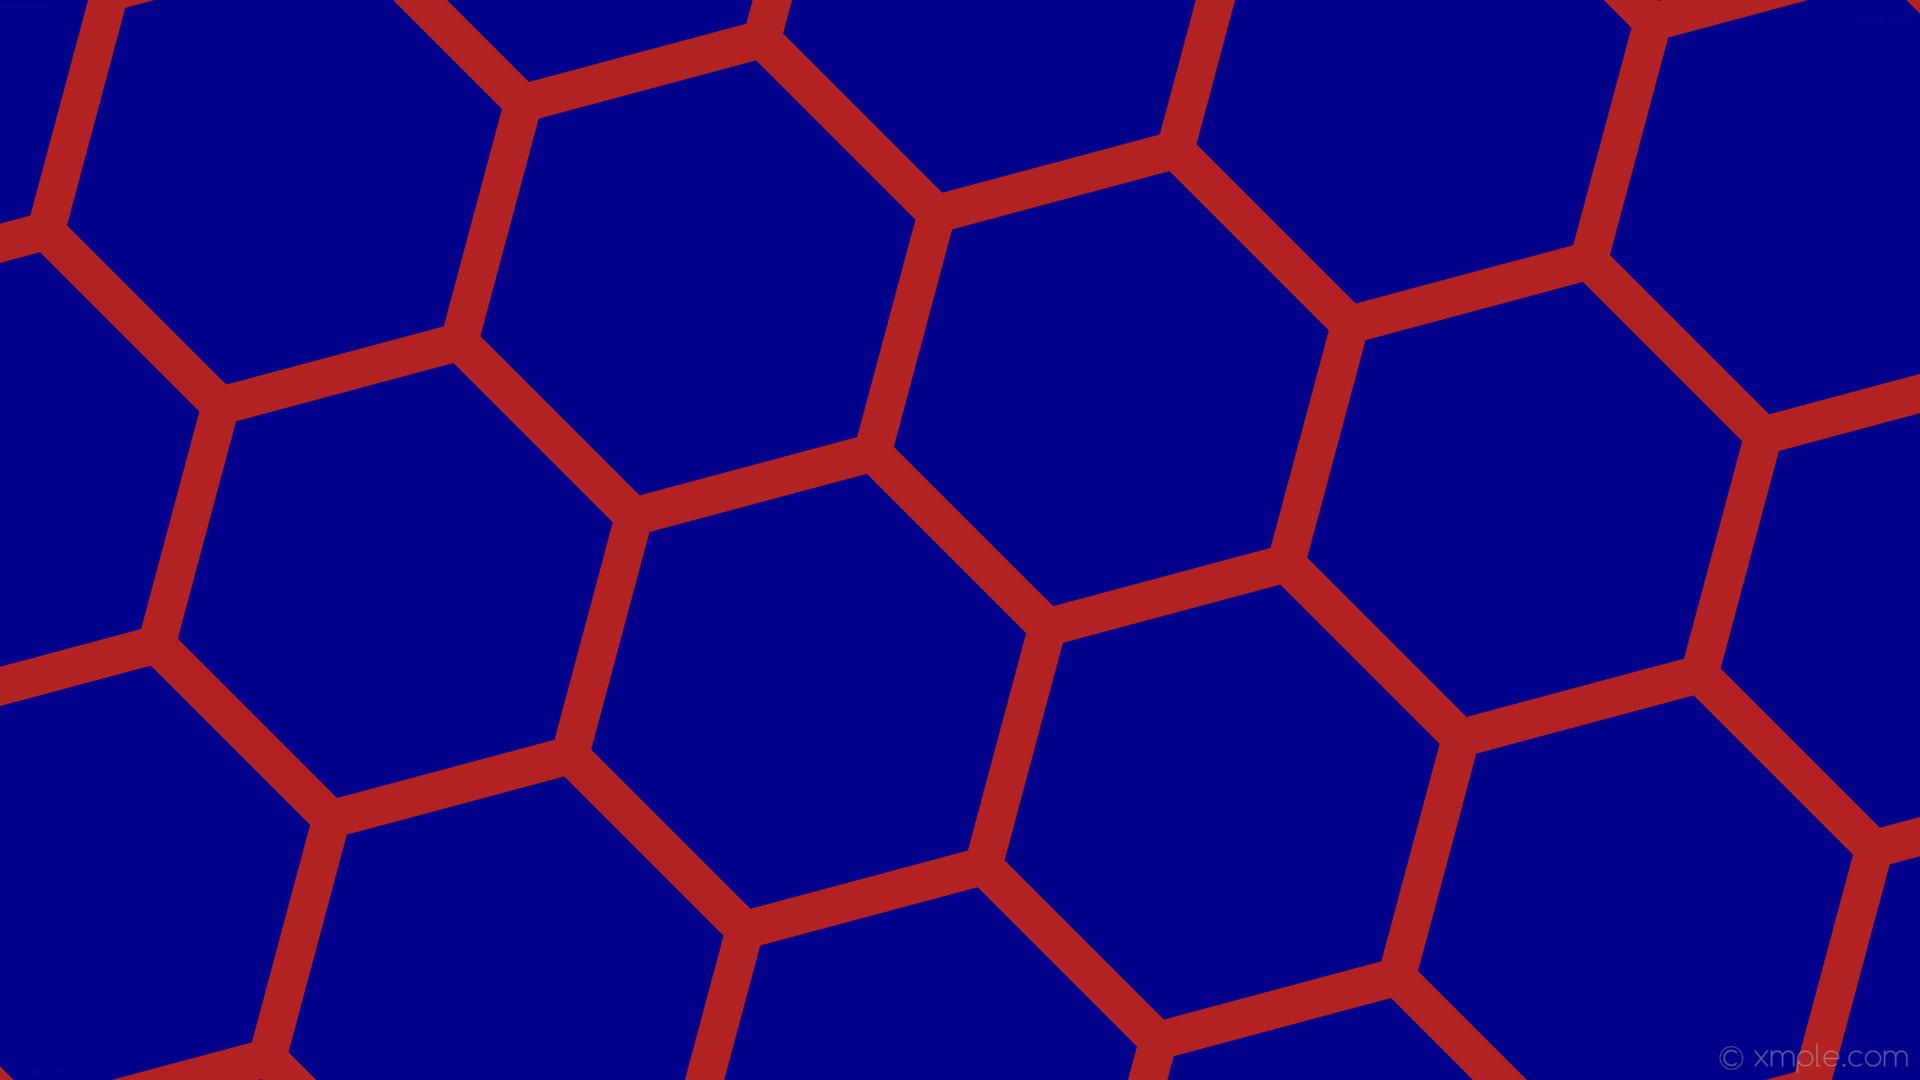 wallpaper beehive honeycomb red hexagon blue dark blue fire brick #00008b  #b22222 diagonal 45